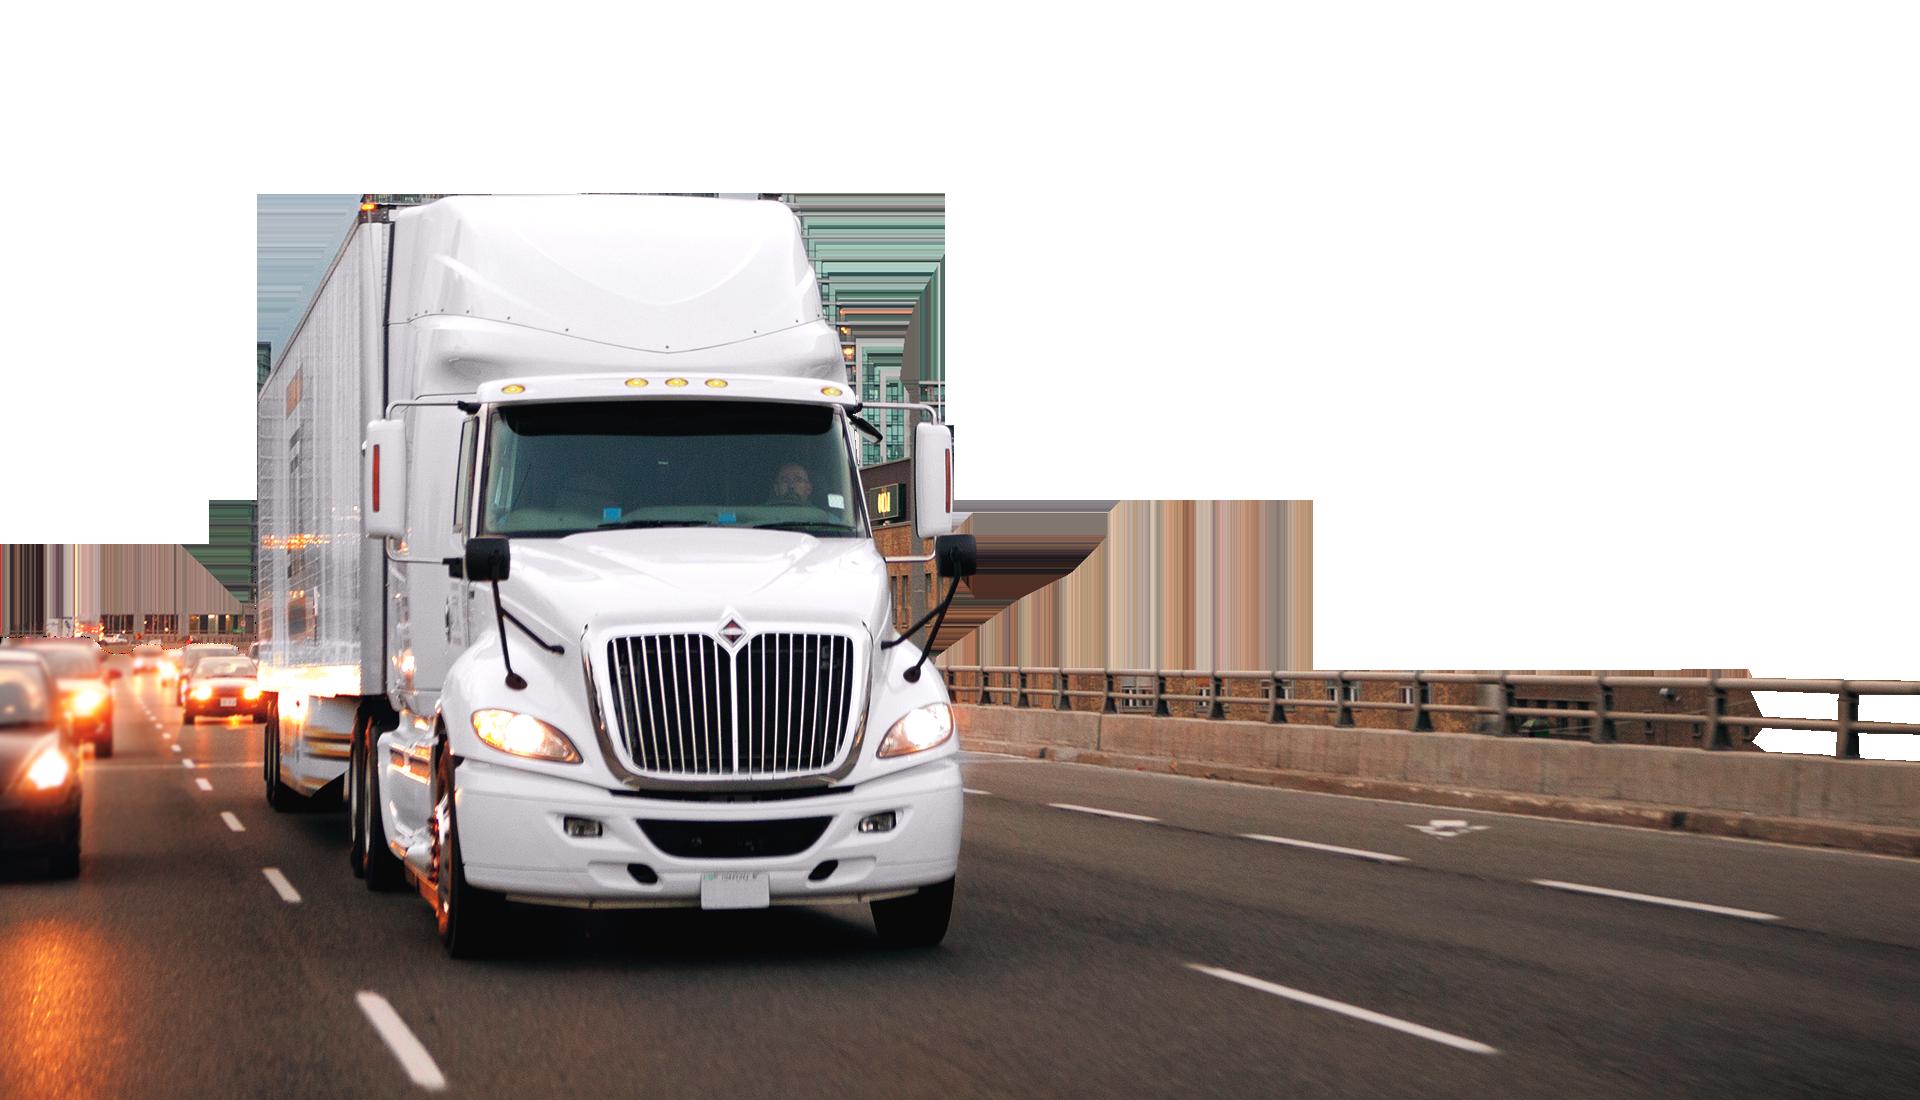 White semi truck on a road.